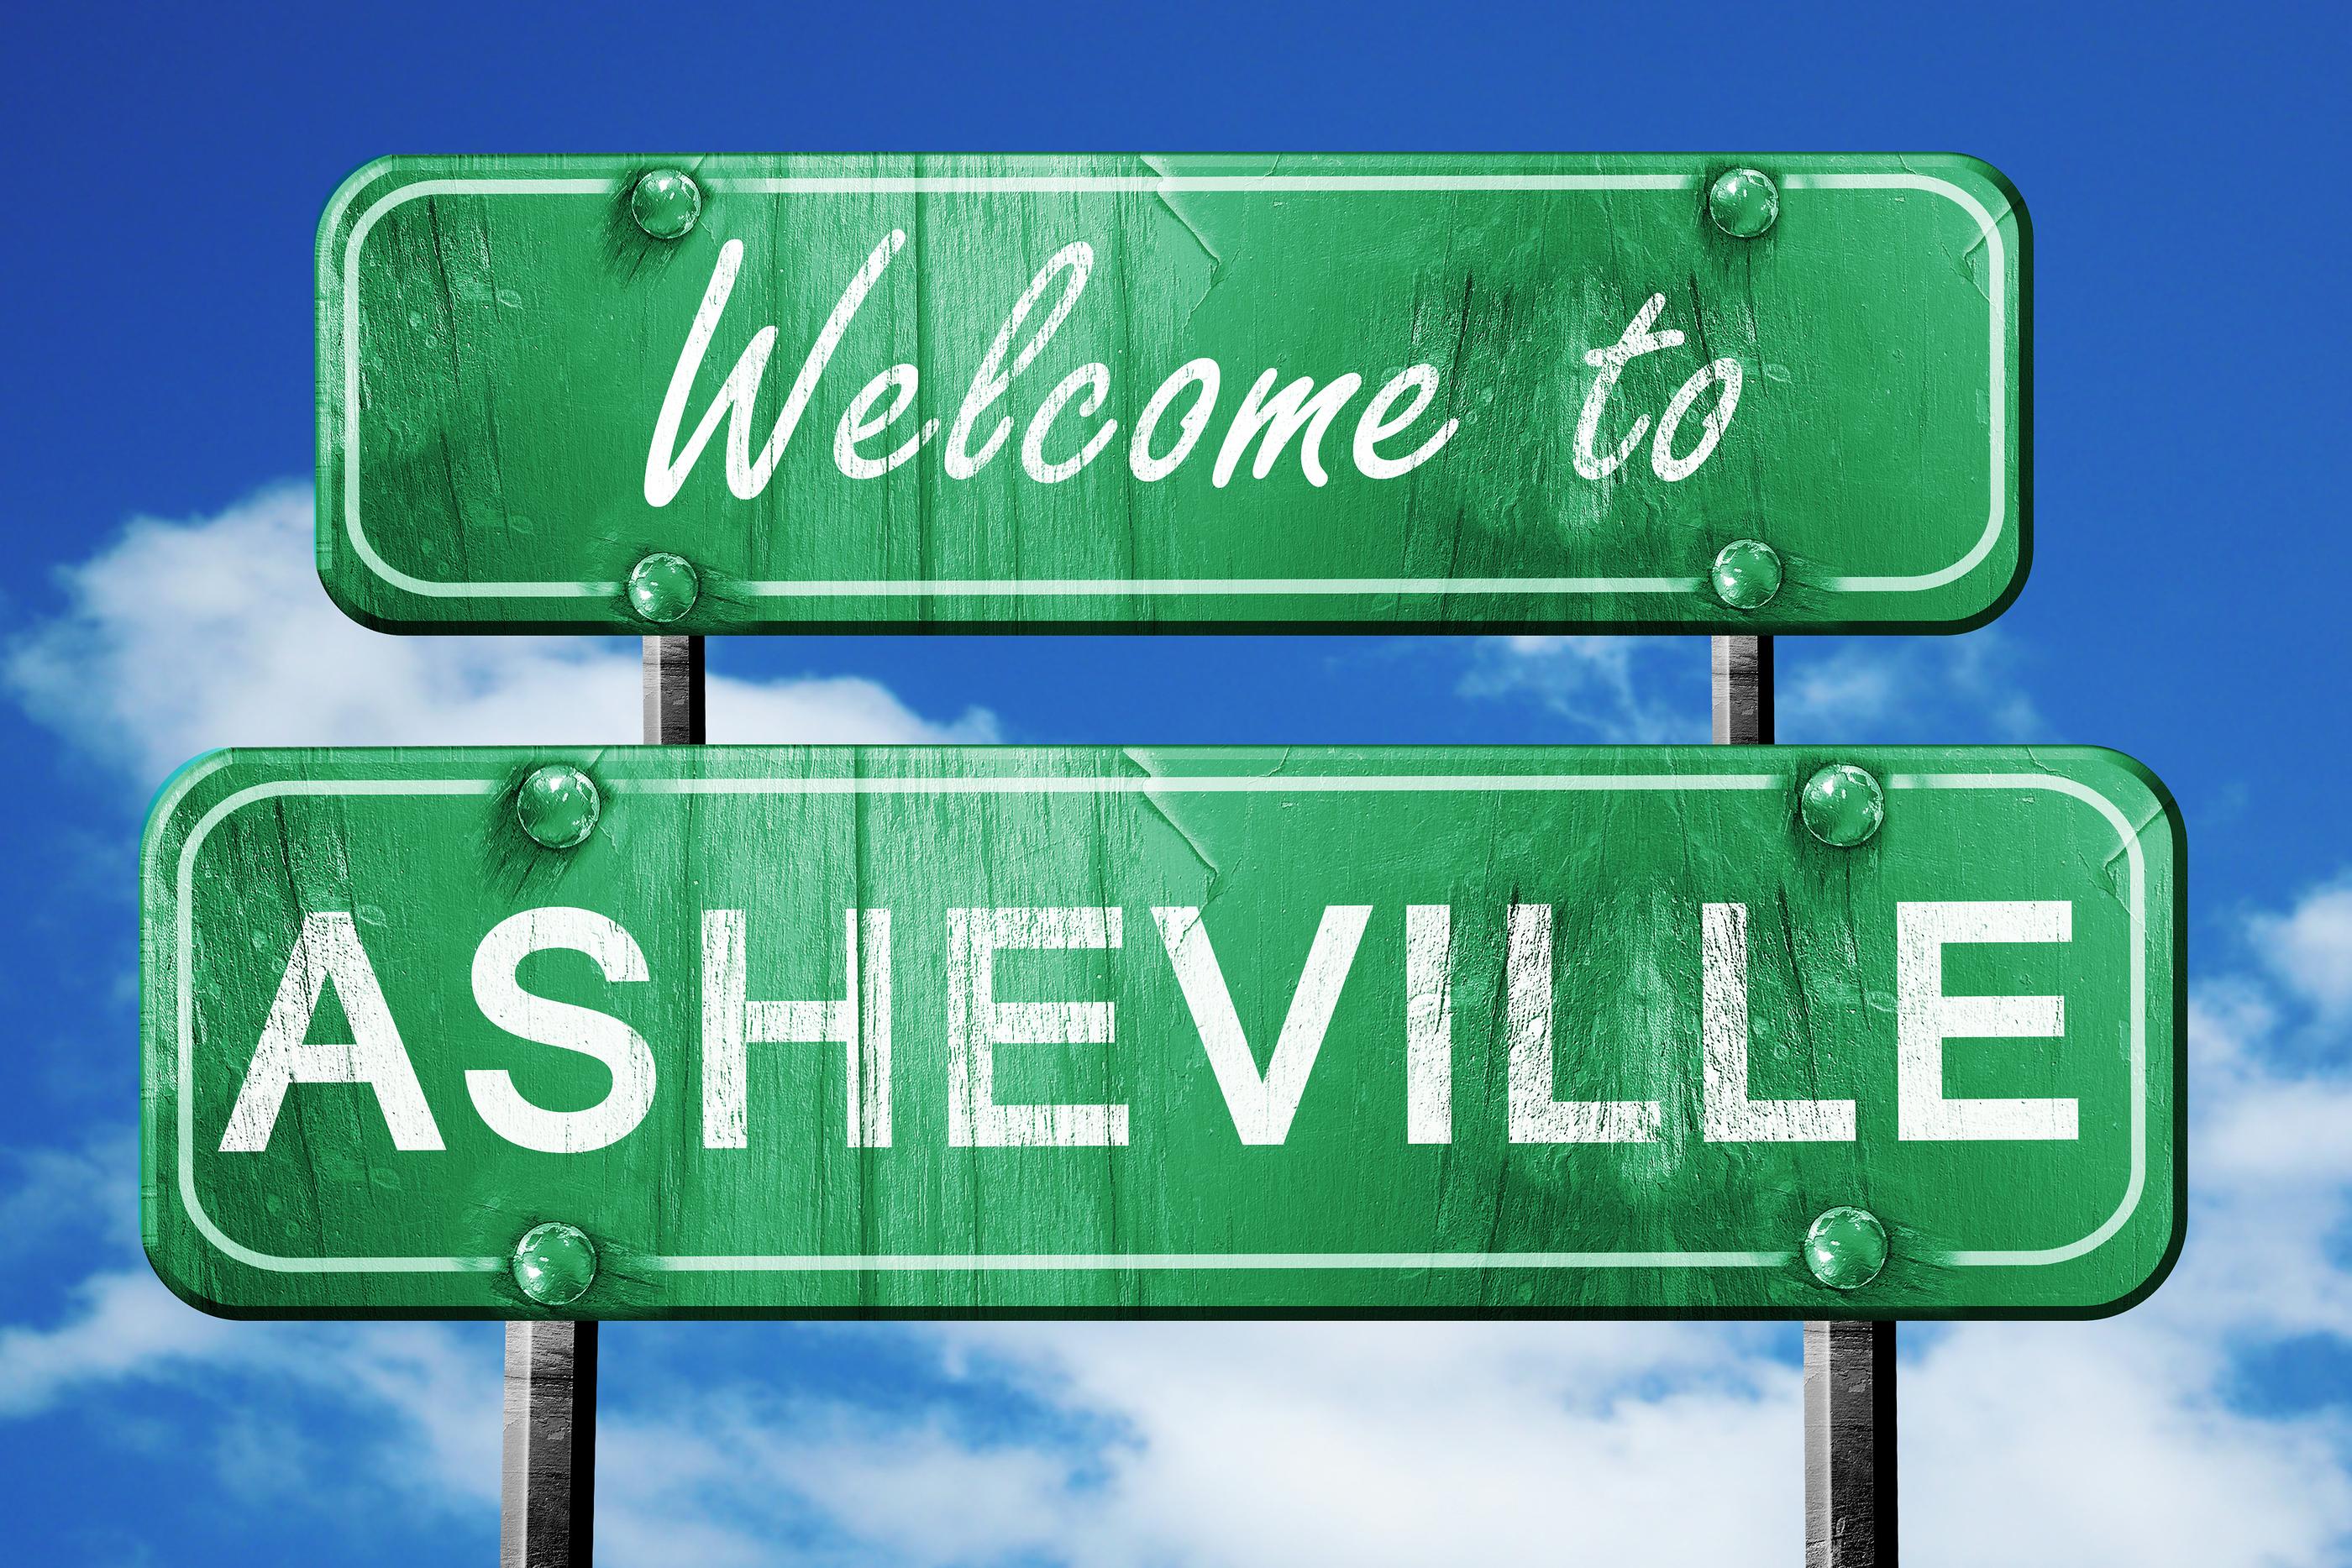 asheville vintage green road sign with blue sky background